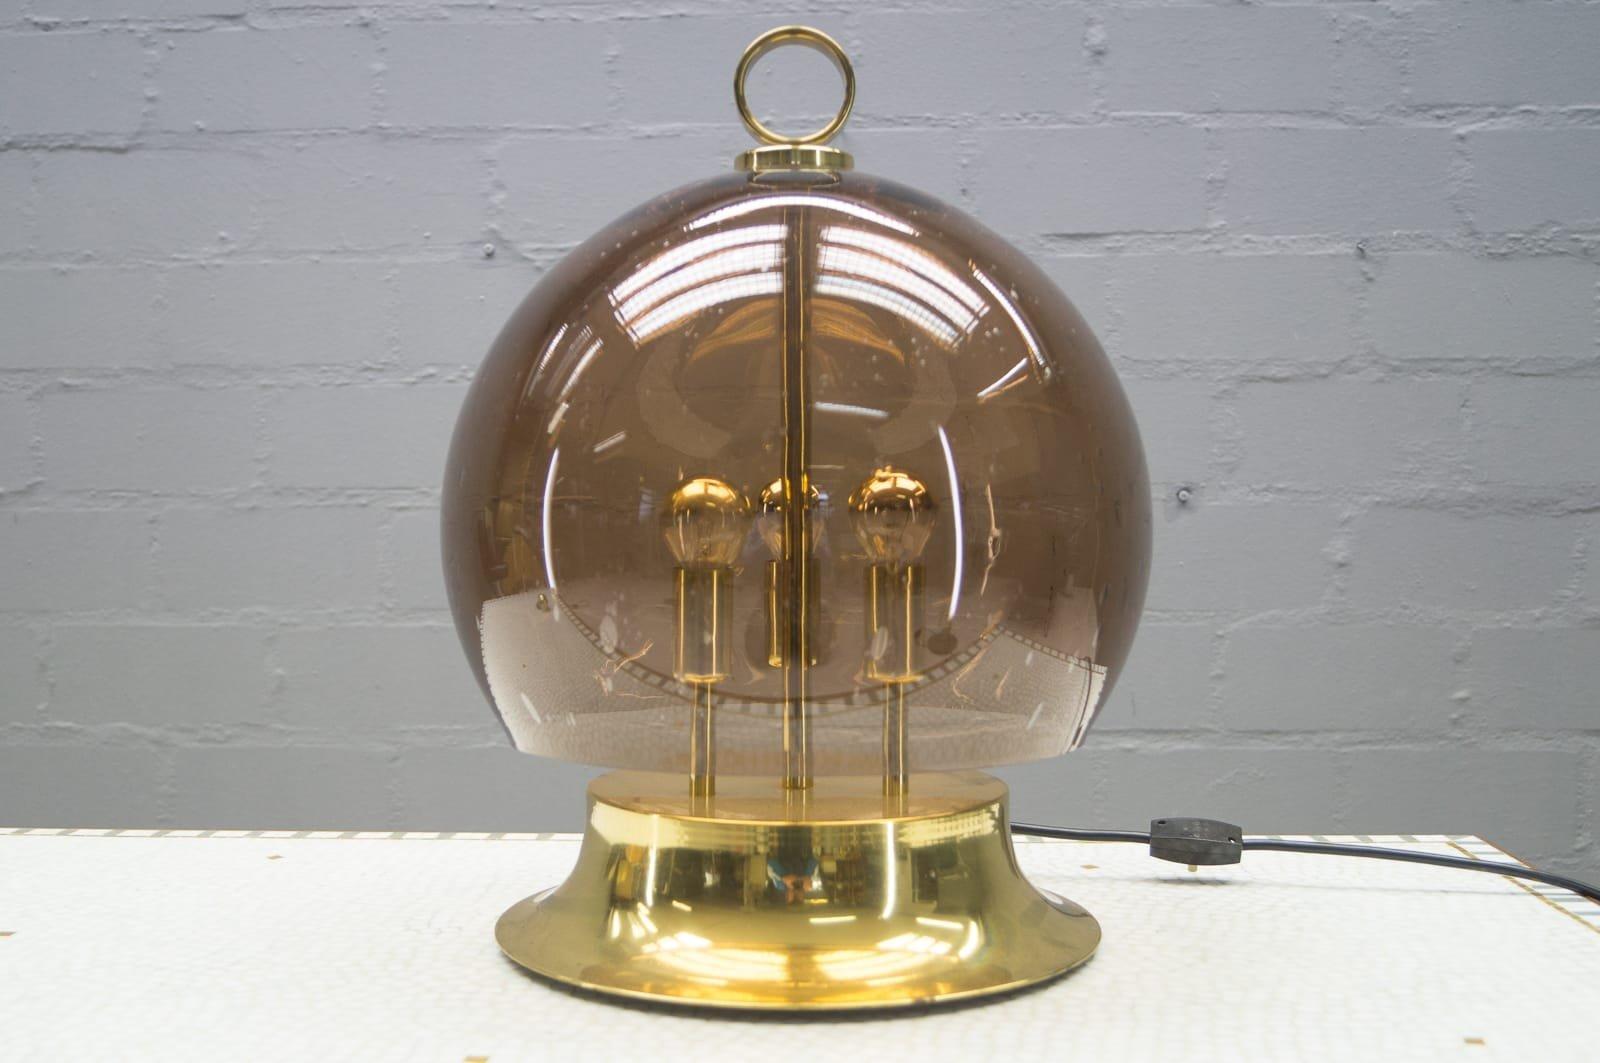 Table de bureau en or avec globe en verre fum souffl la bouche 1960s en vente sur pamono - Table de bureau en verre ...